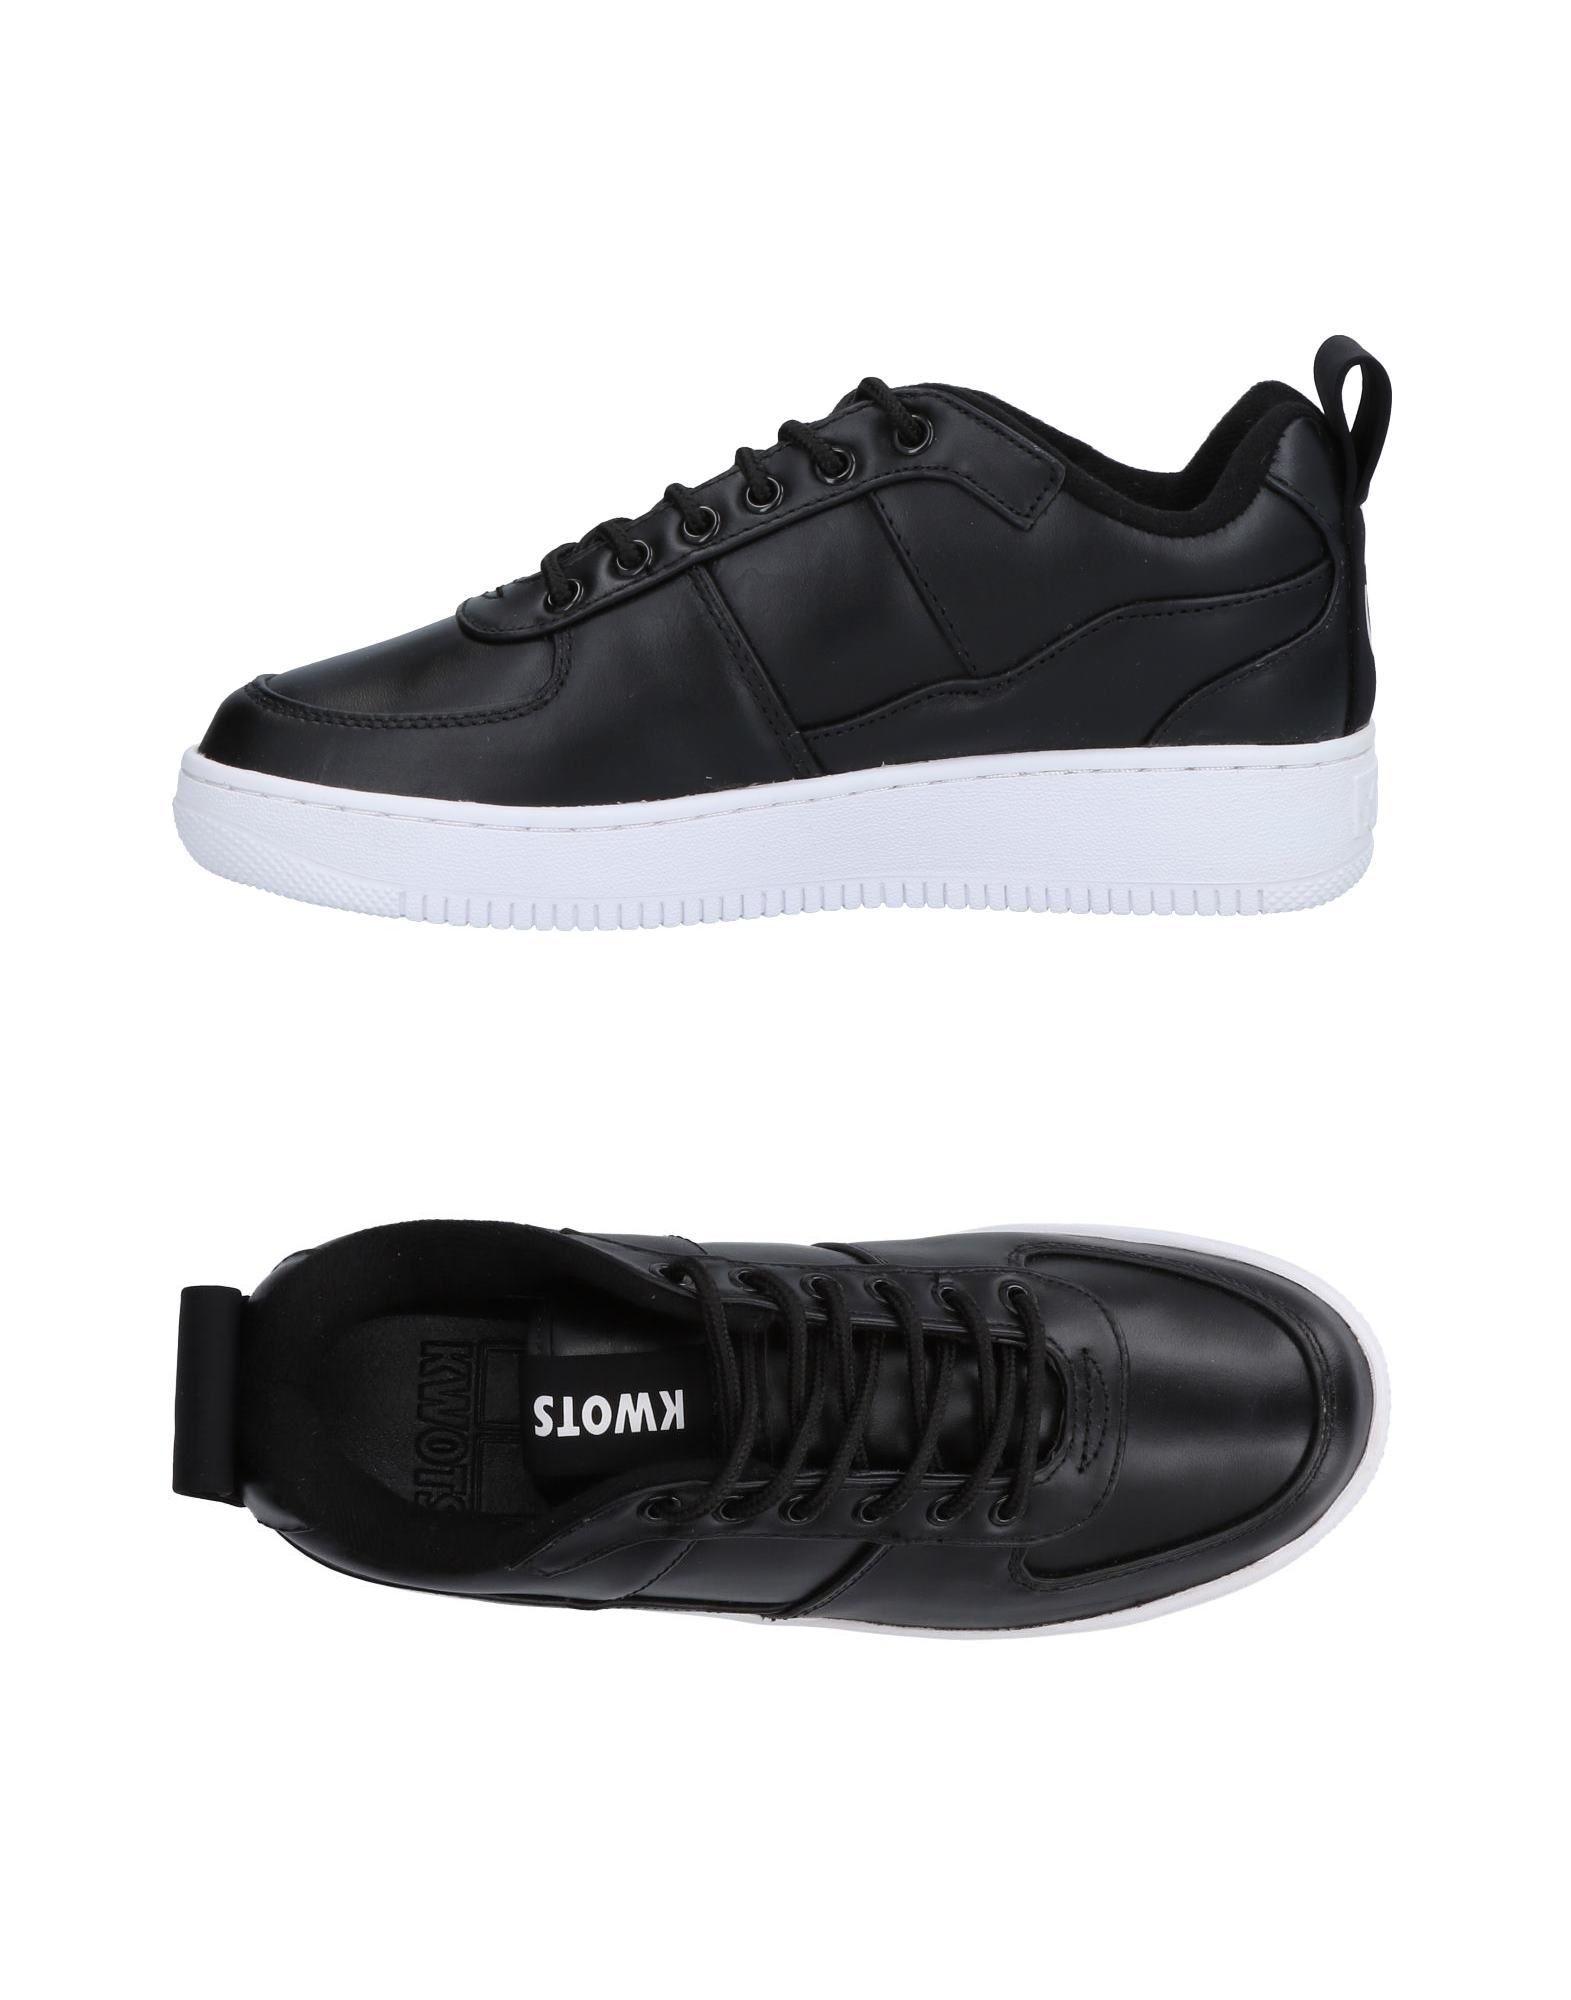 KWOTS Sneakers in Black